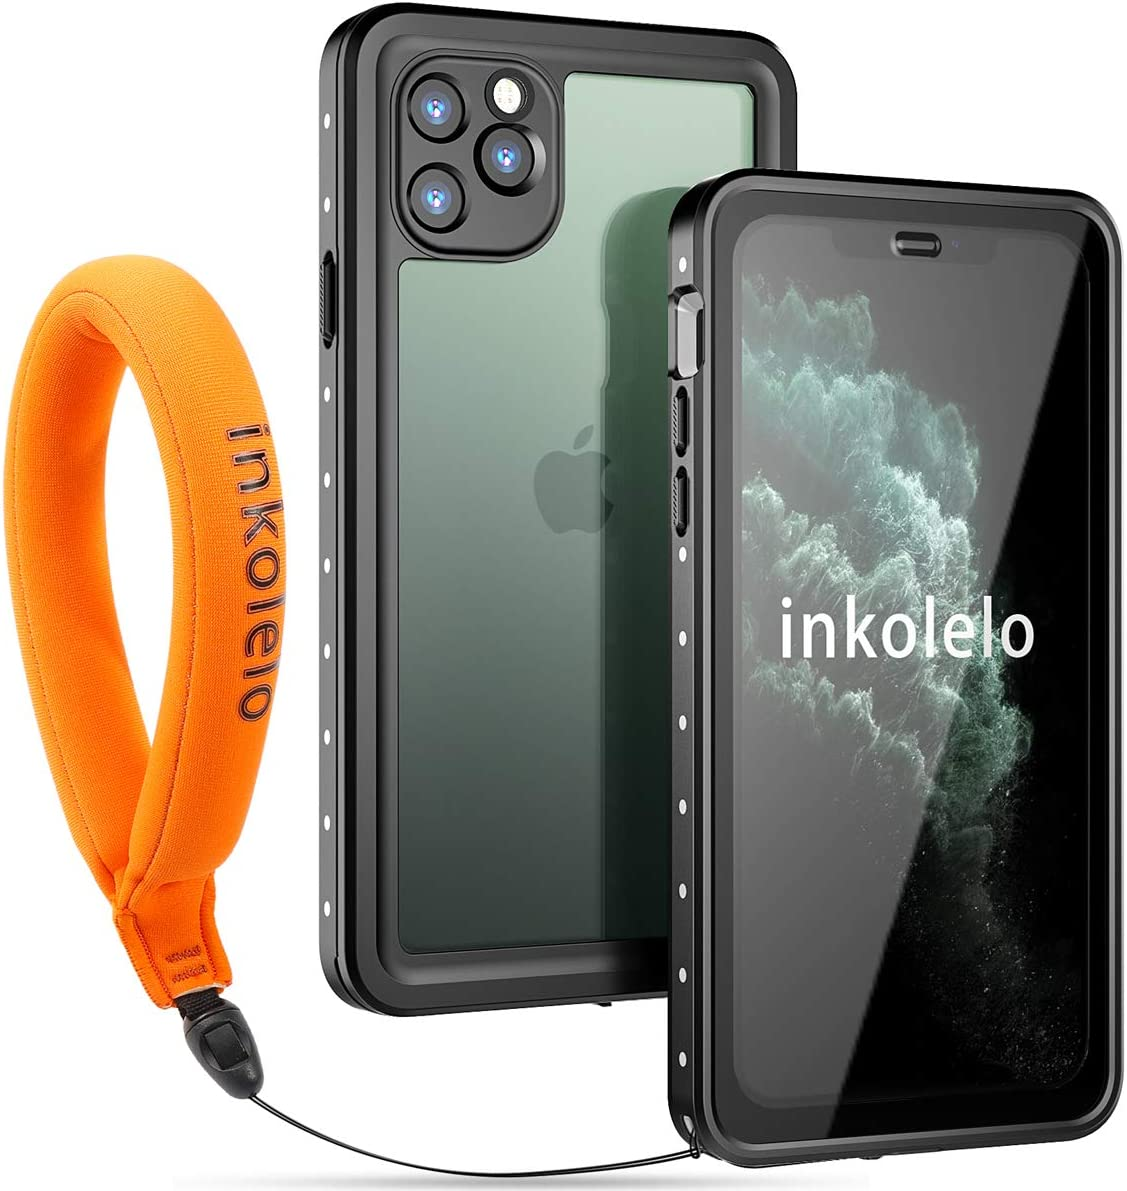 Inkolelo iPhone 11 Pro Max Waterproof Case, Built-in Screen Full-Body Protector with Floating Strap IP68 Waterproof Case for iPhone 11 Pro Max 6.5 inch Case (2019) - Matte Black/Orange